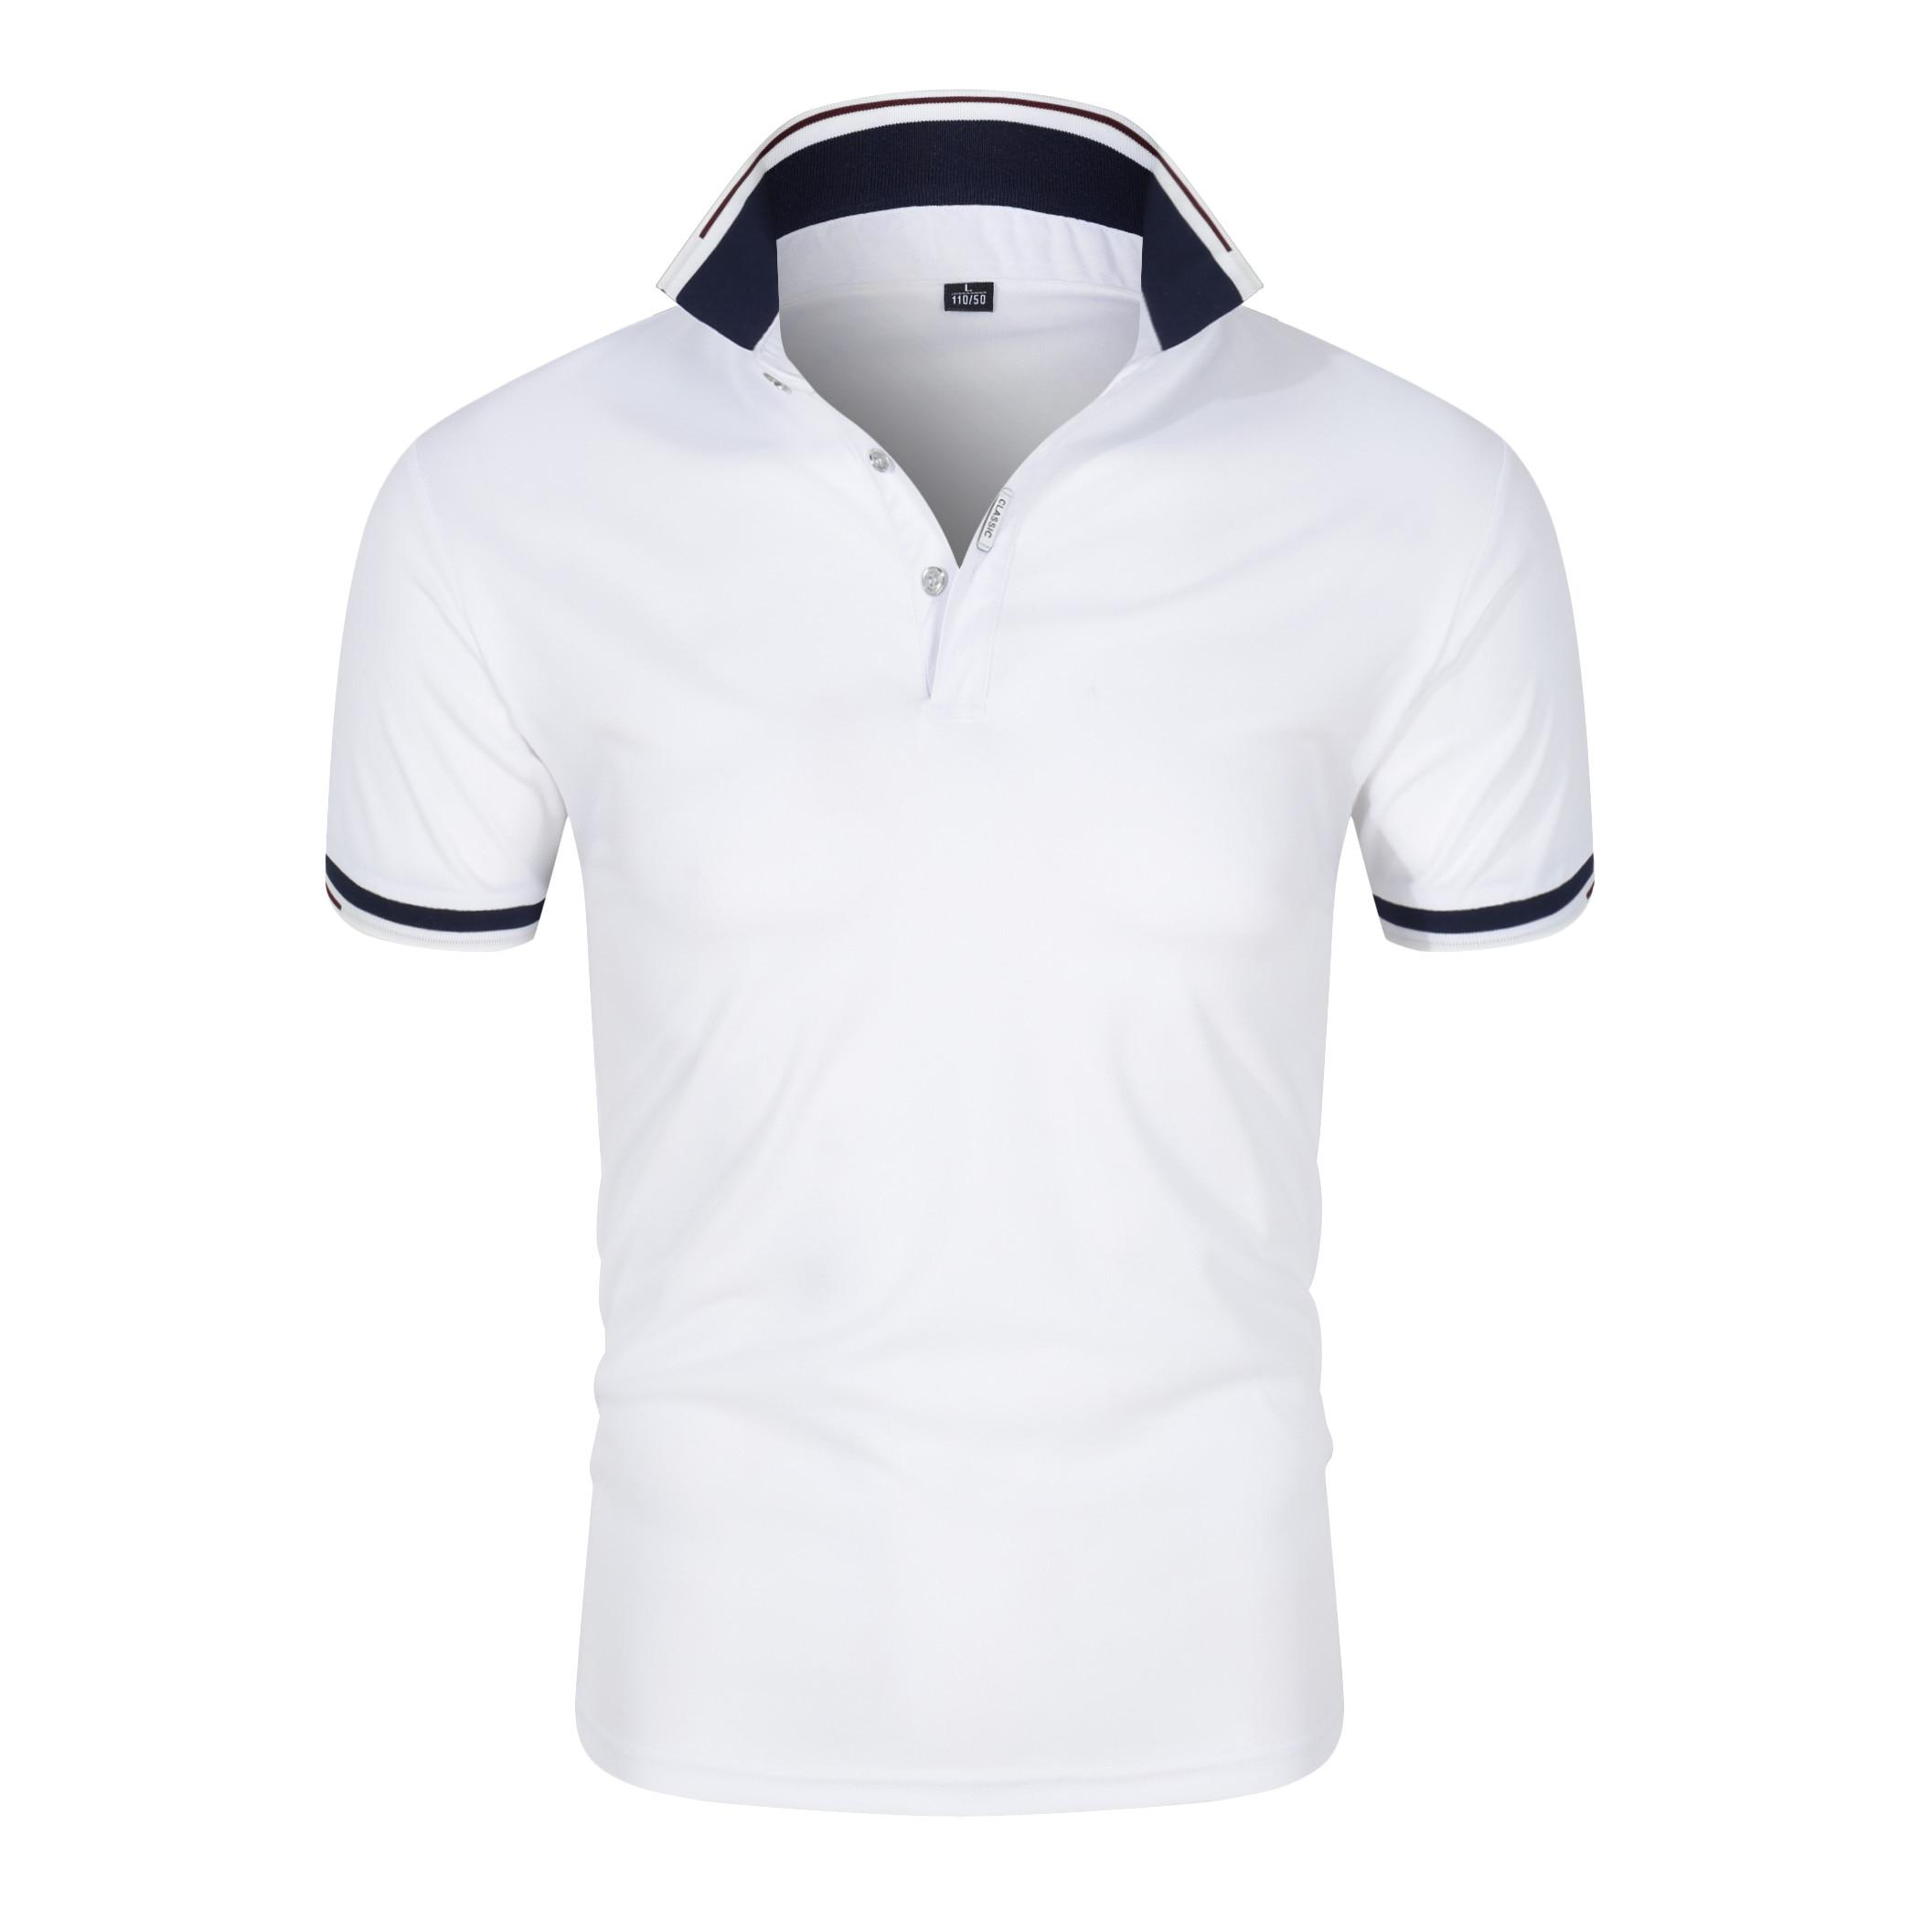 Fashion T Shirt Running Men Quick Dry breathable T-Shirts Running Slim Fit Tops Tees Sport Fitness Gym golf Tennis T Shirts Tee недорого